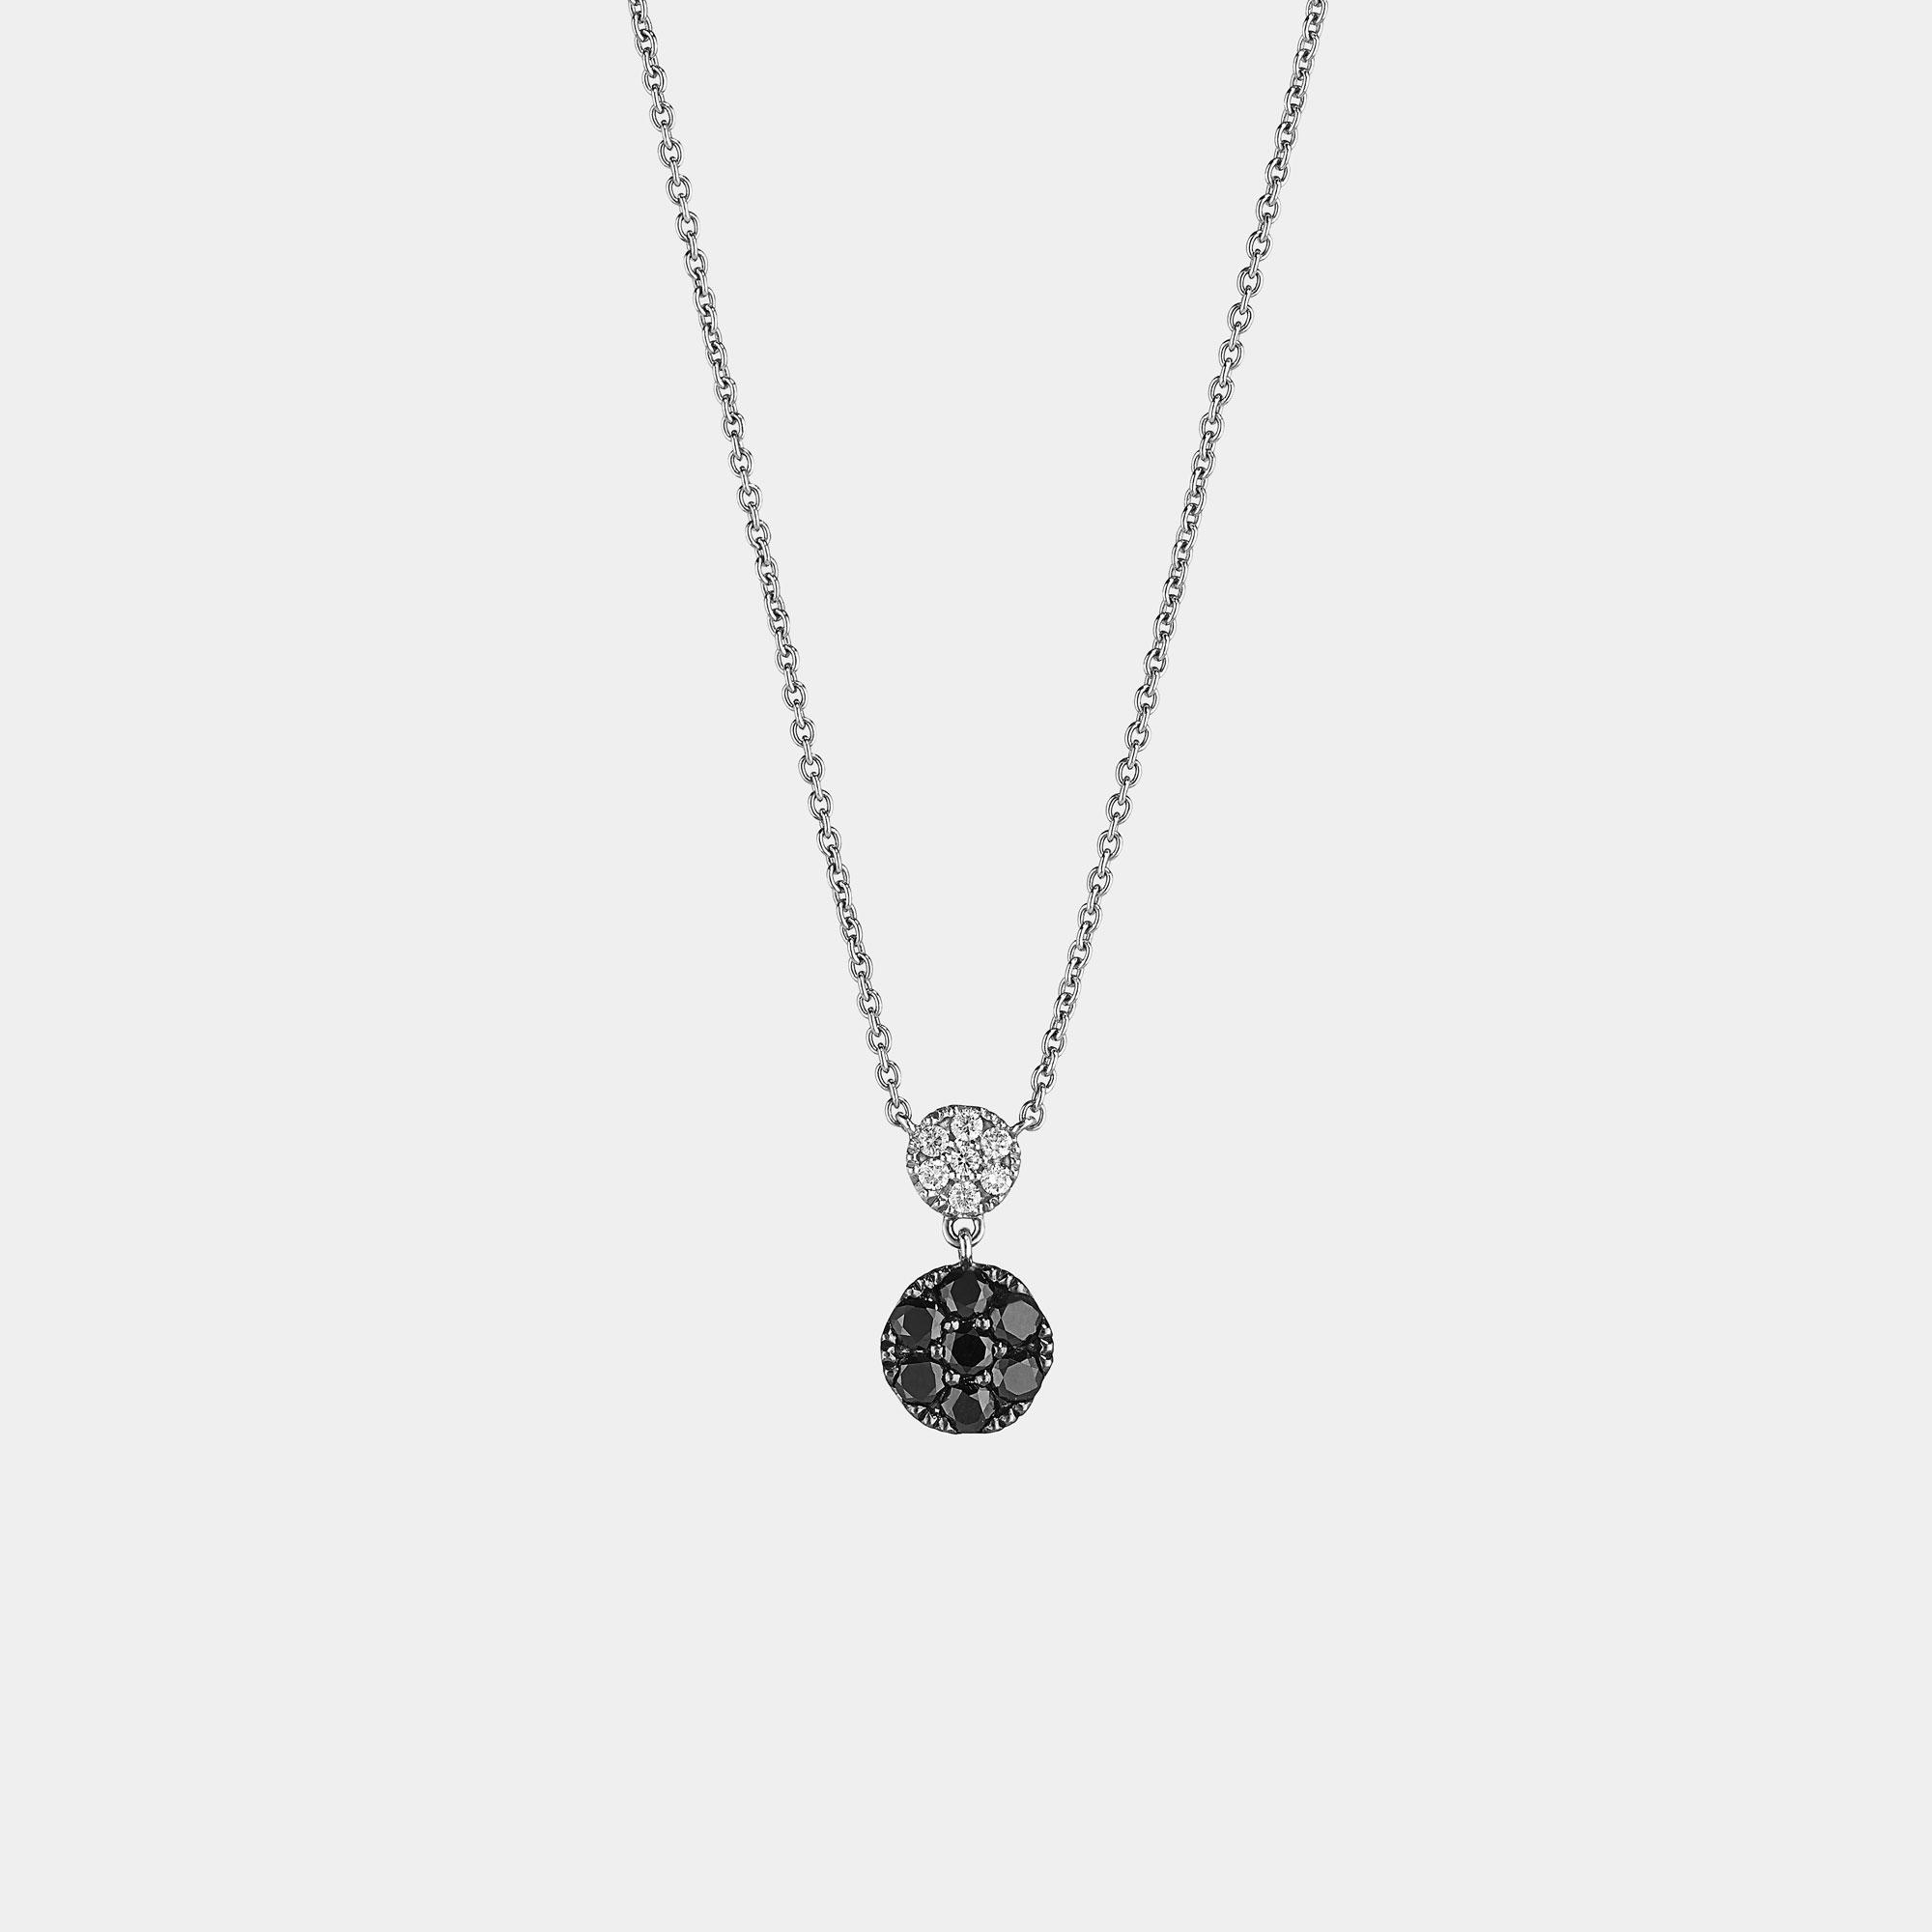 Collana Girocollo oro bianco diamanti neri CL019